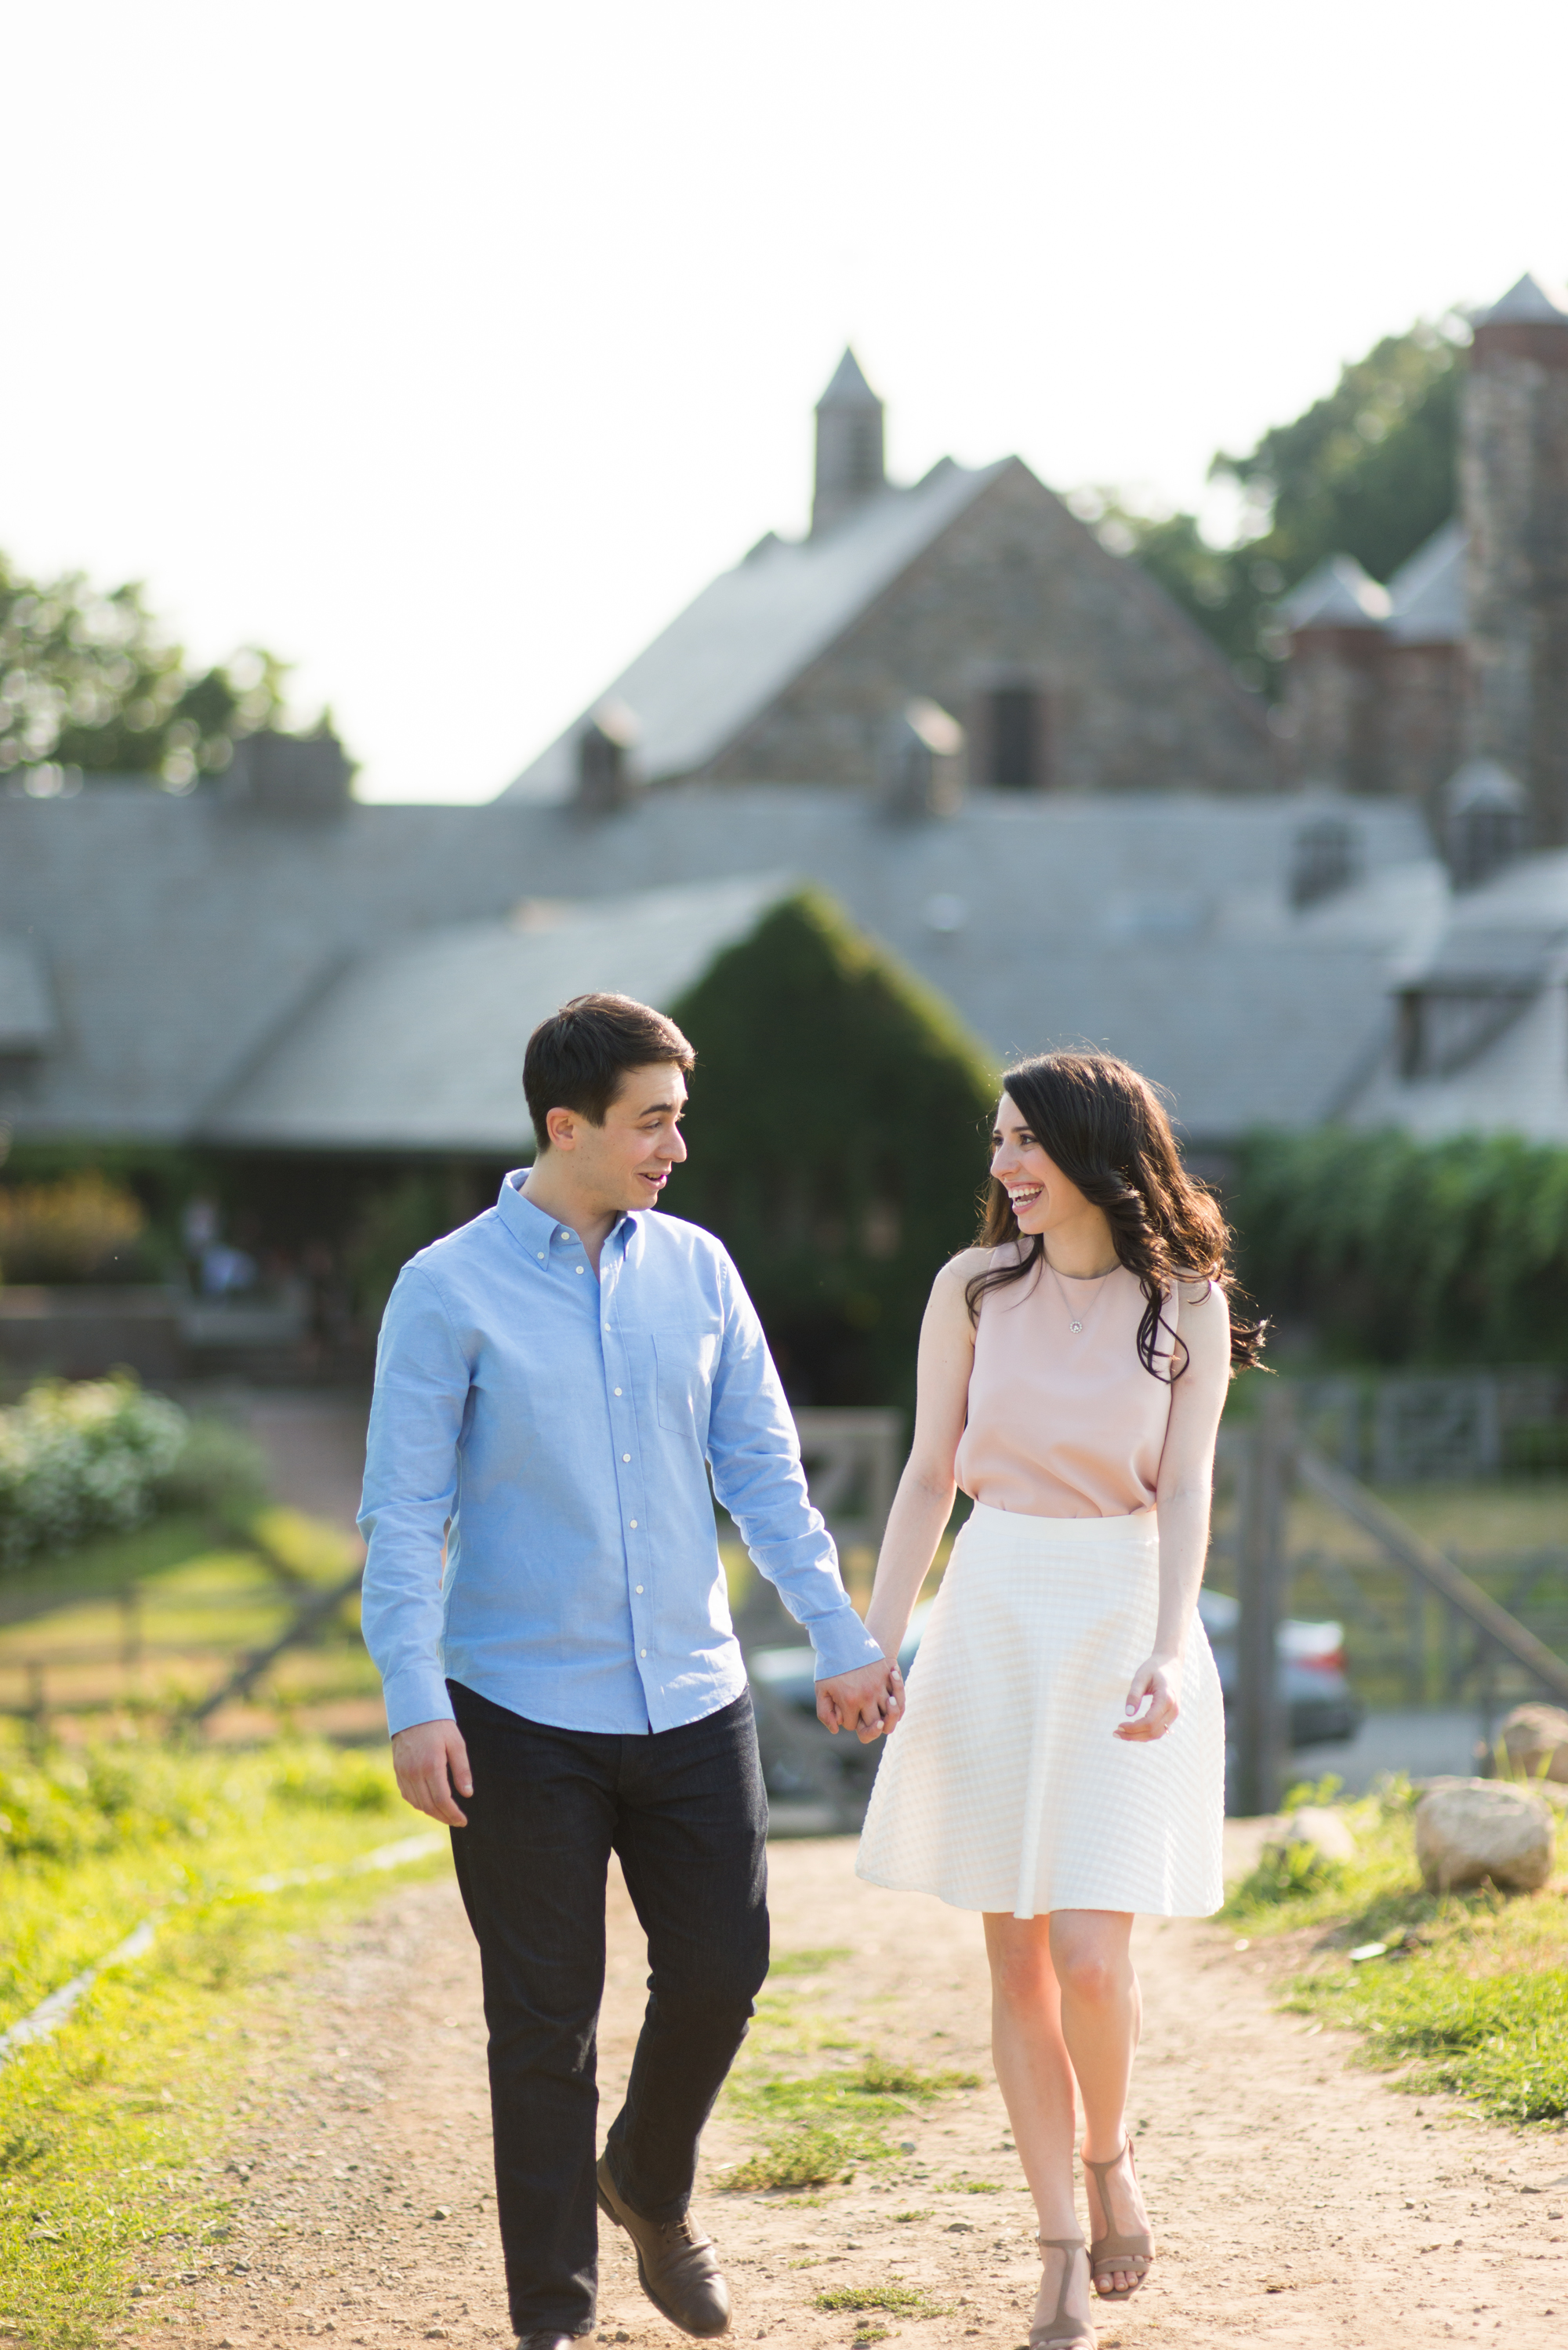 Emily&Aaron_Engagement152.JPG